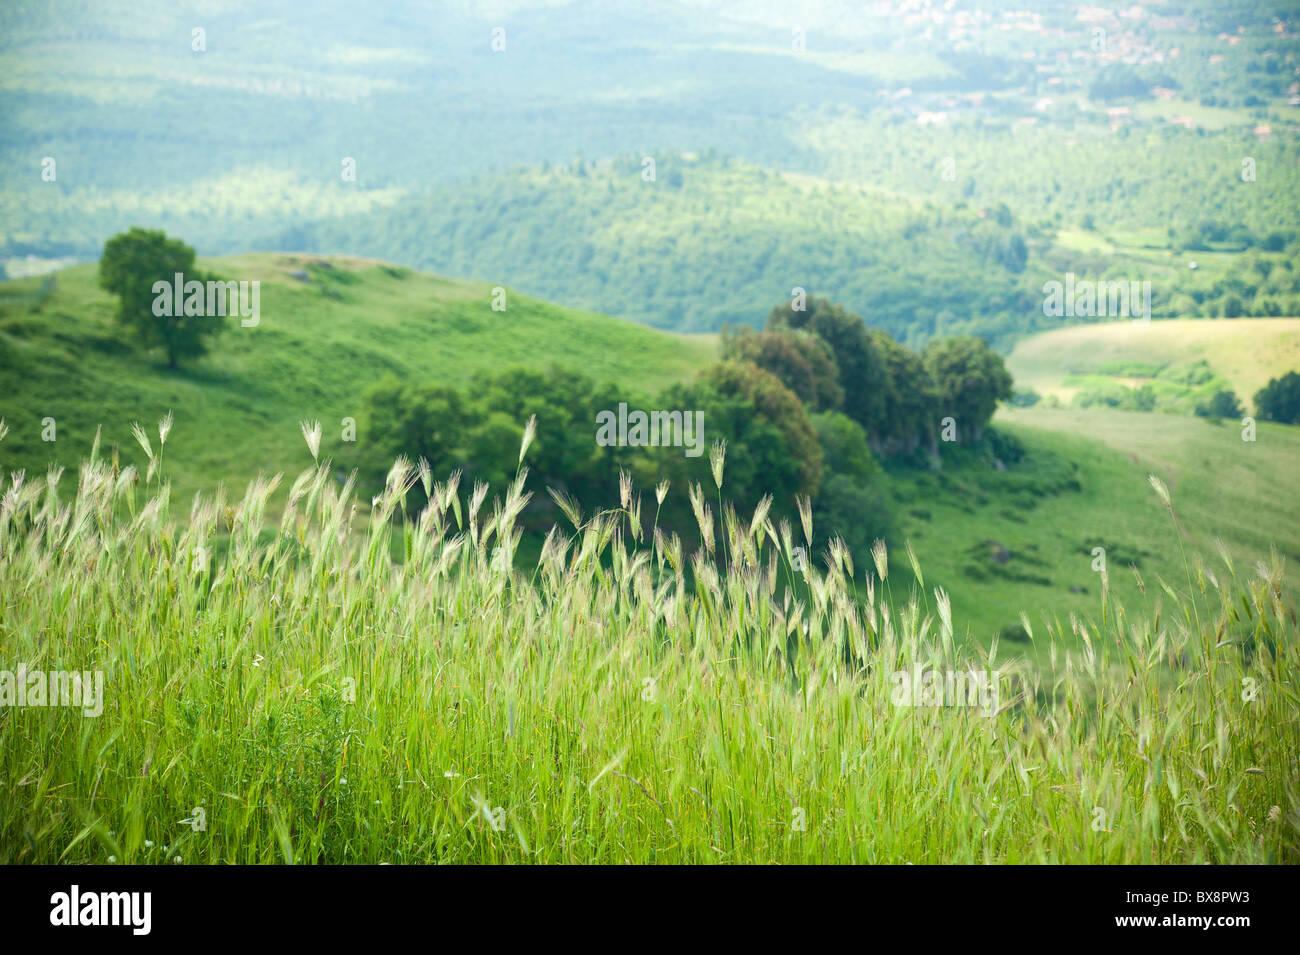 Grass field landscape - Stock Image